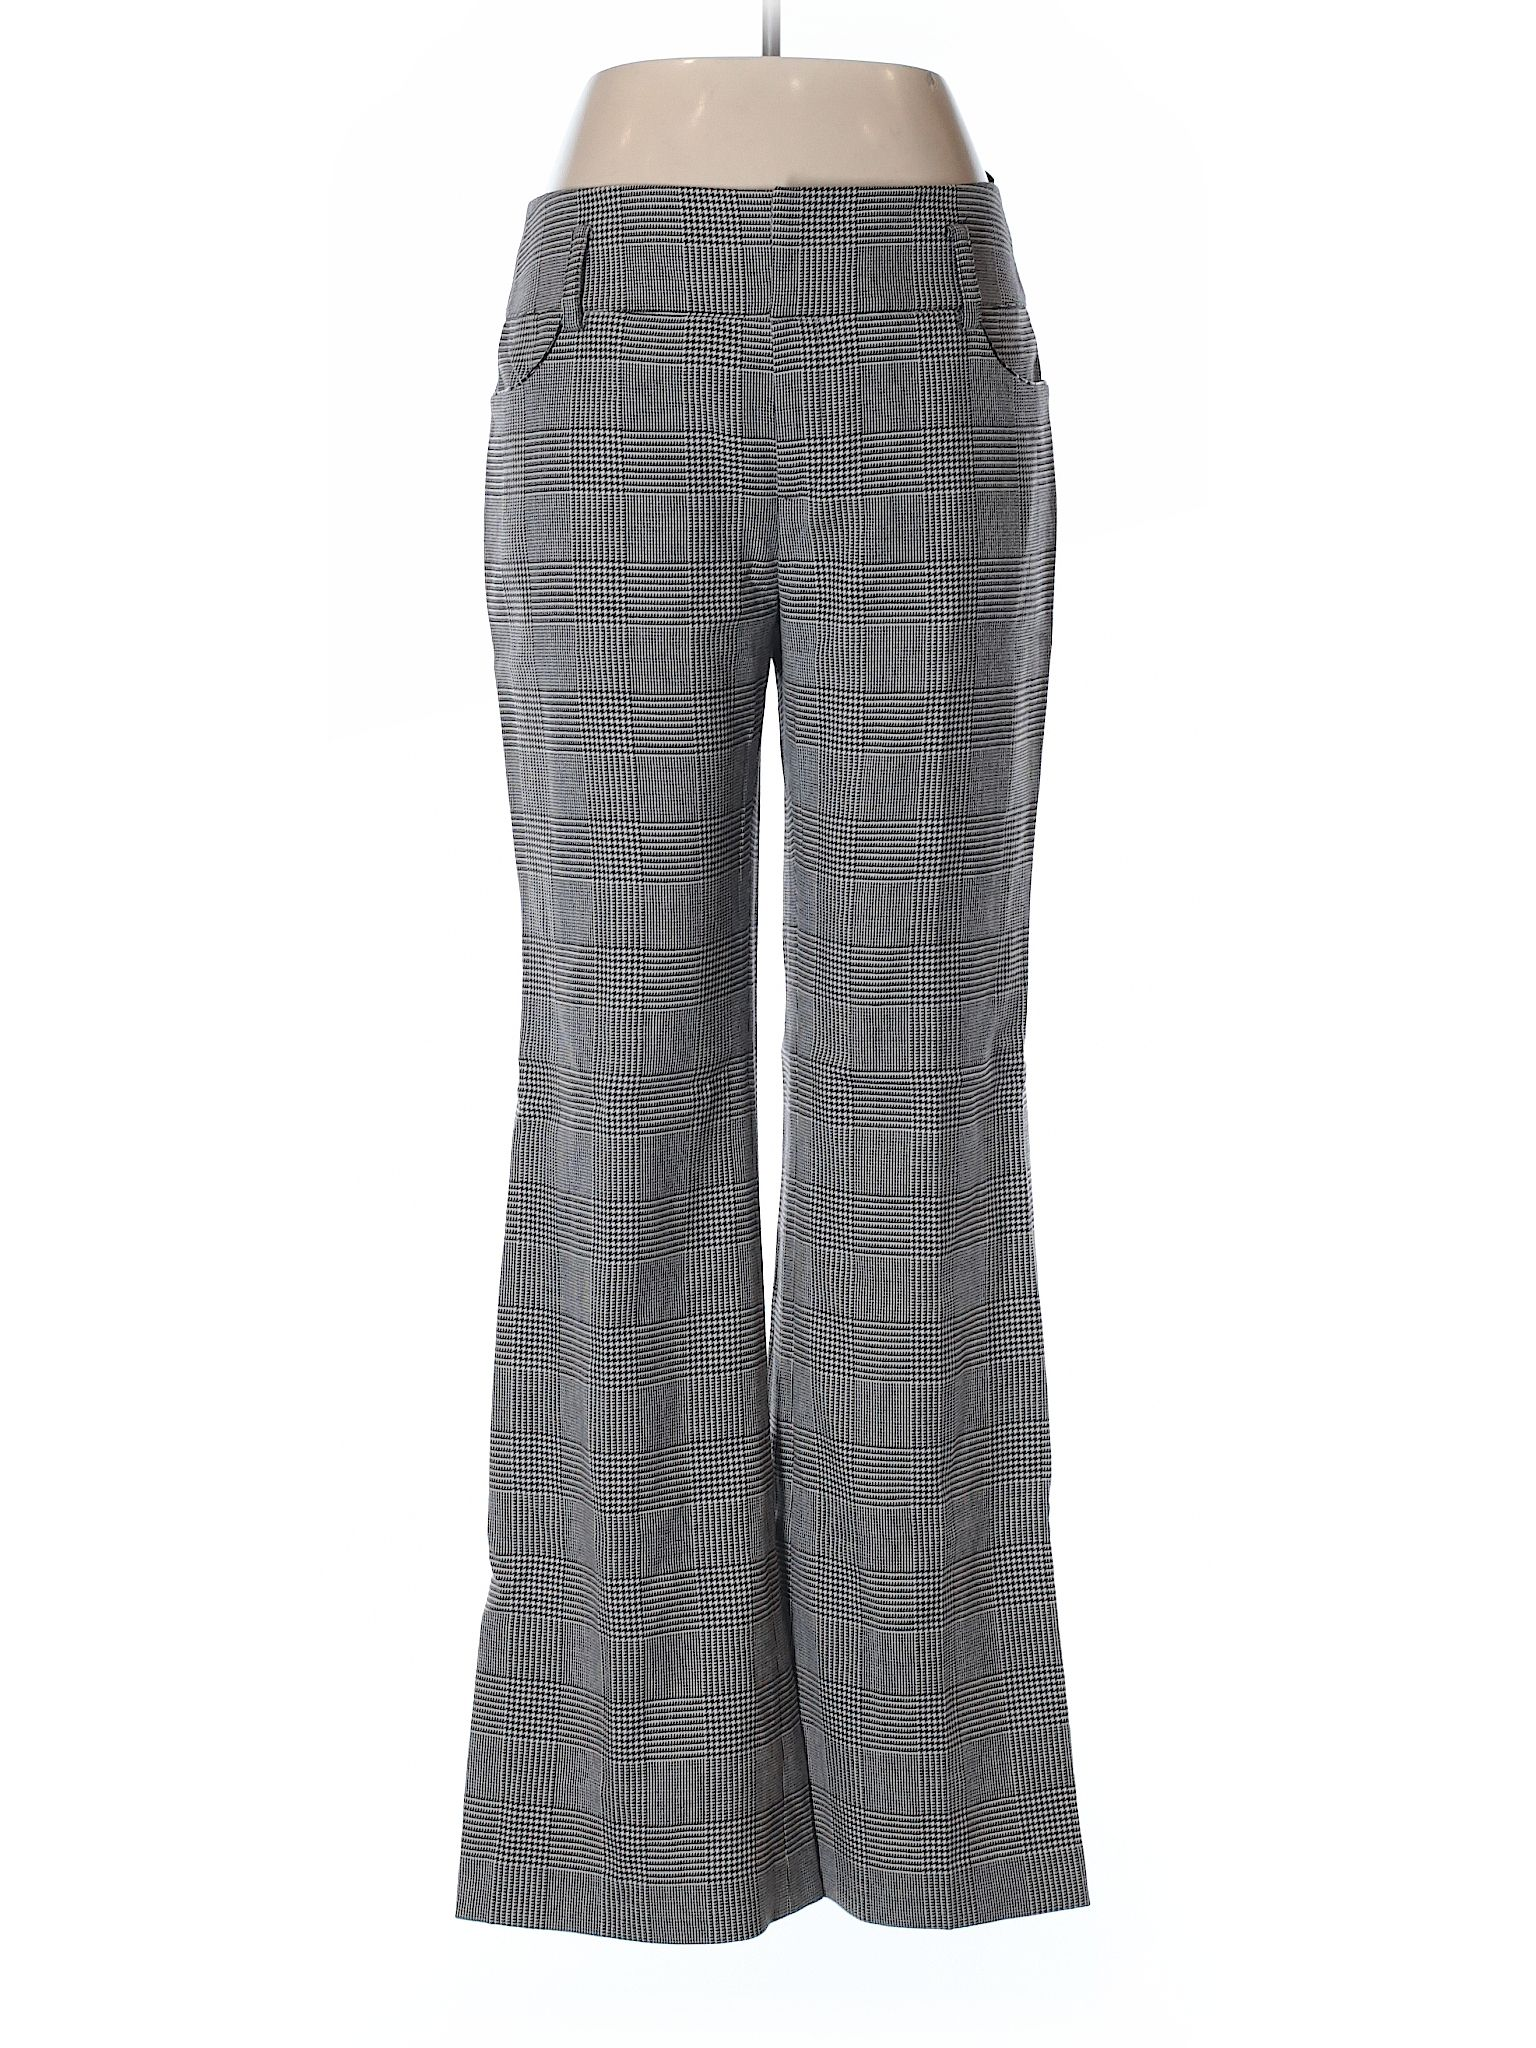 Nine West Dress Pants  Black Women s Bottoms - 23712763 2f7730b049